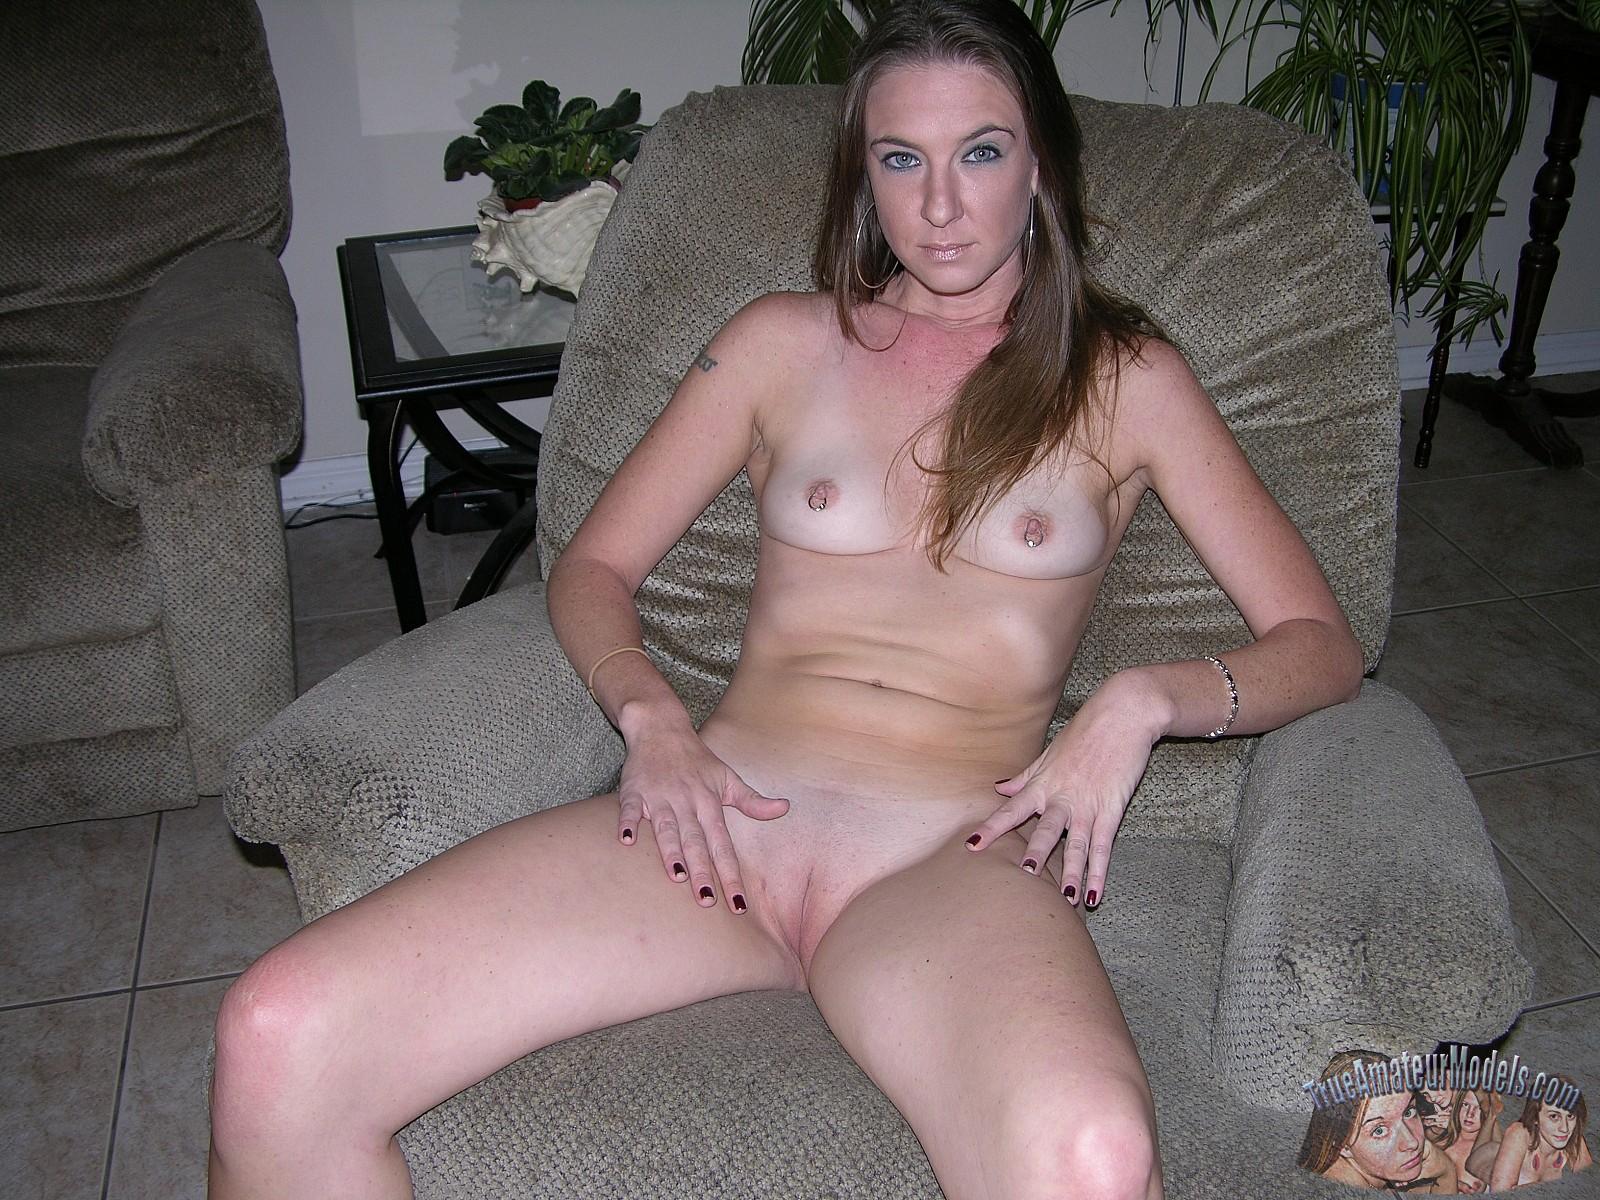 Nude girl on rod